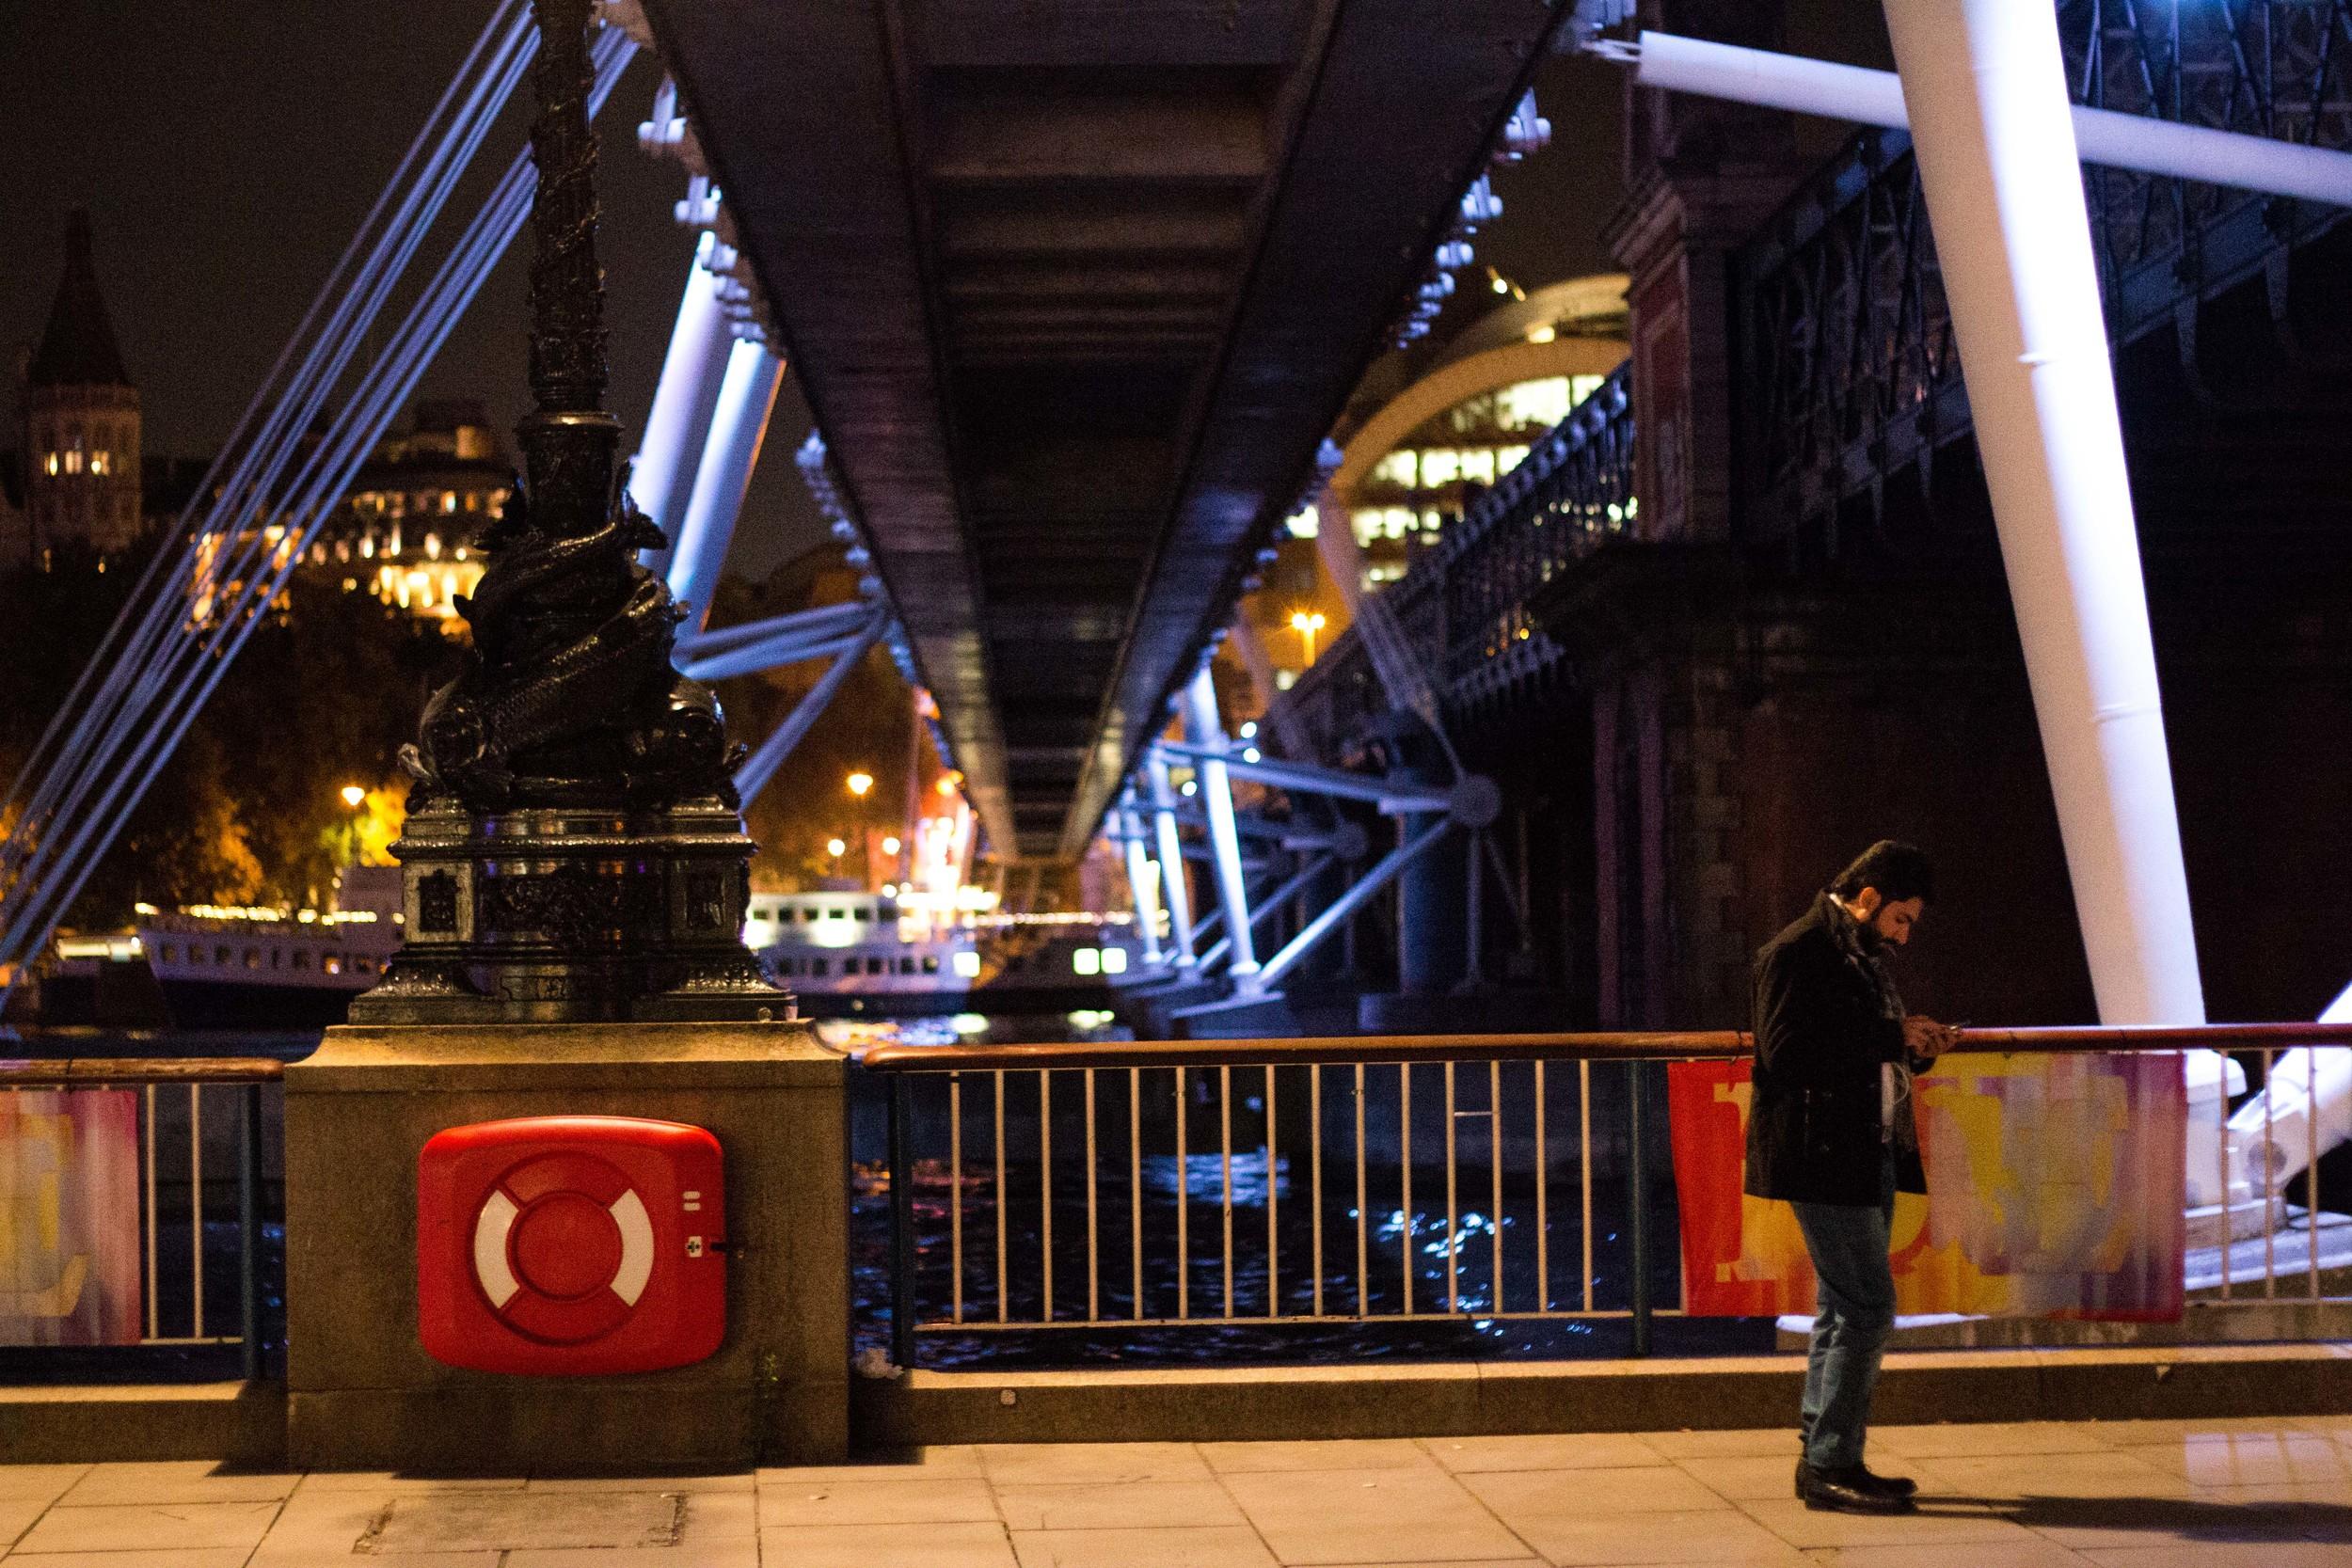 Under the Jubilee Bridges